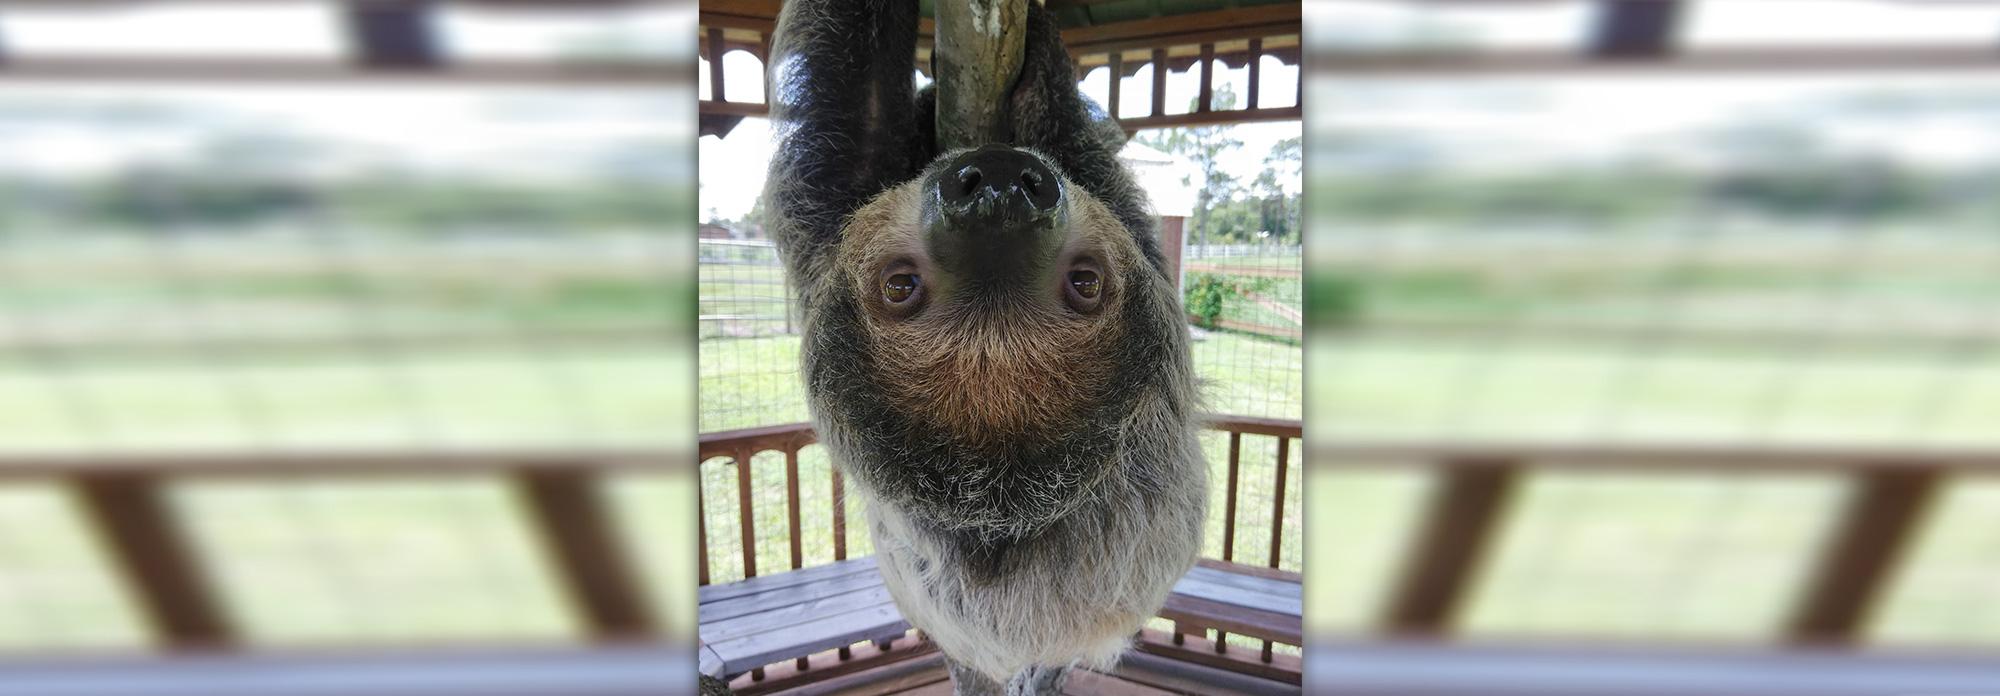 Exotic Animal Encounter | Orlando, FL